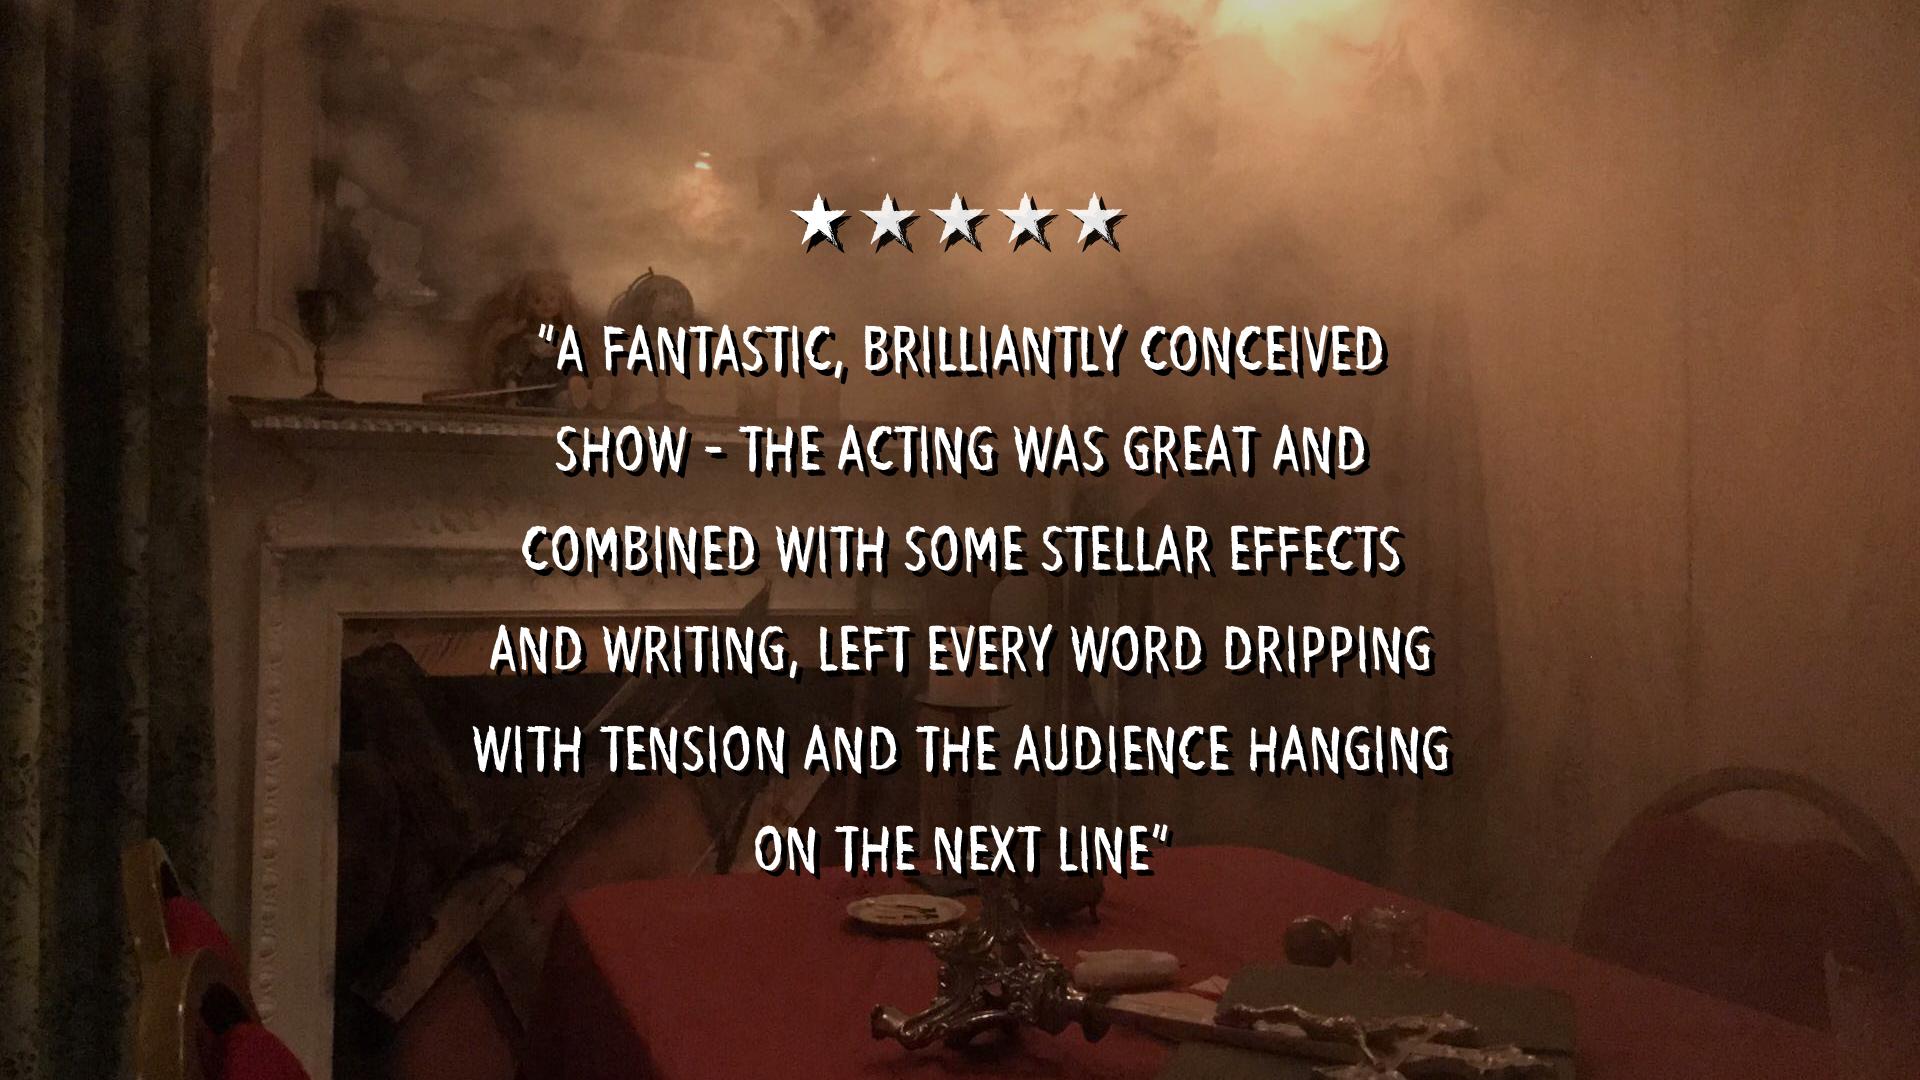 Review Dan Drysdale 02-02-19 - Copy.png